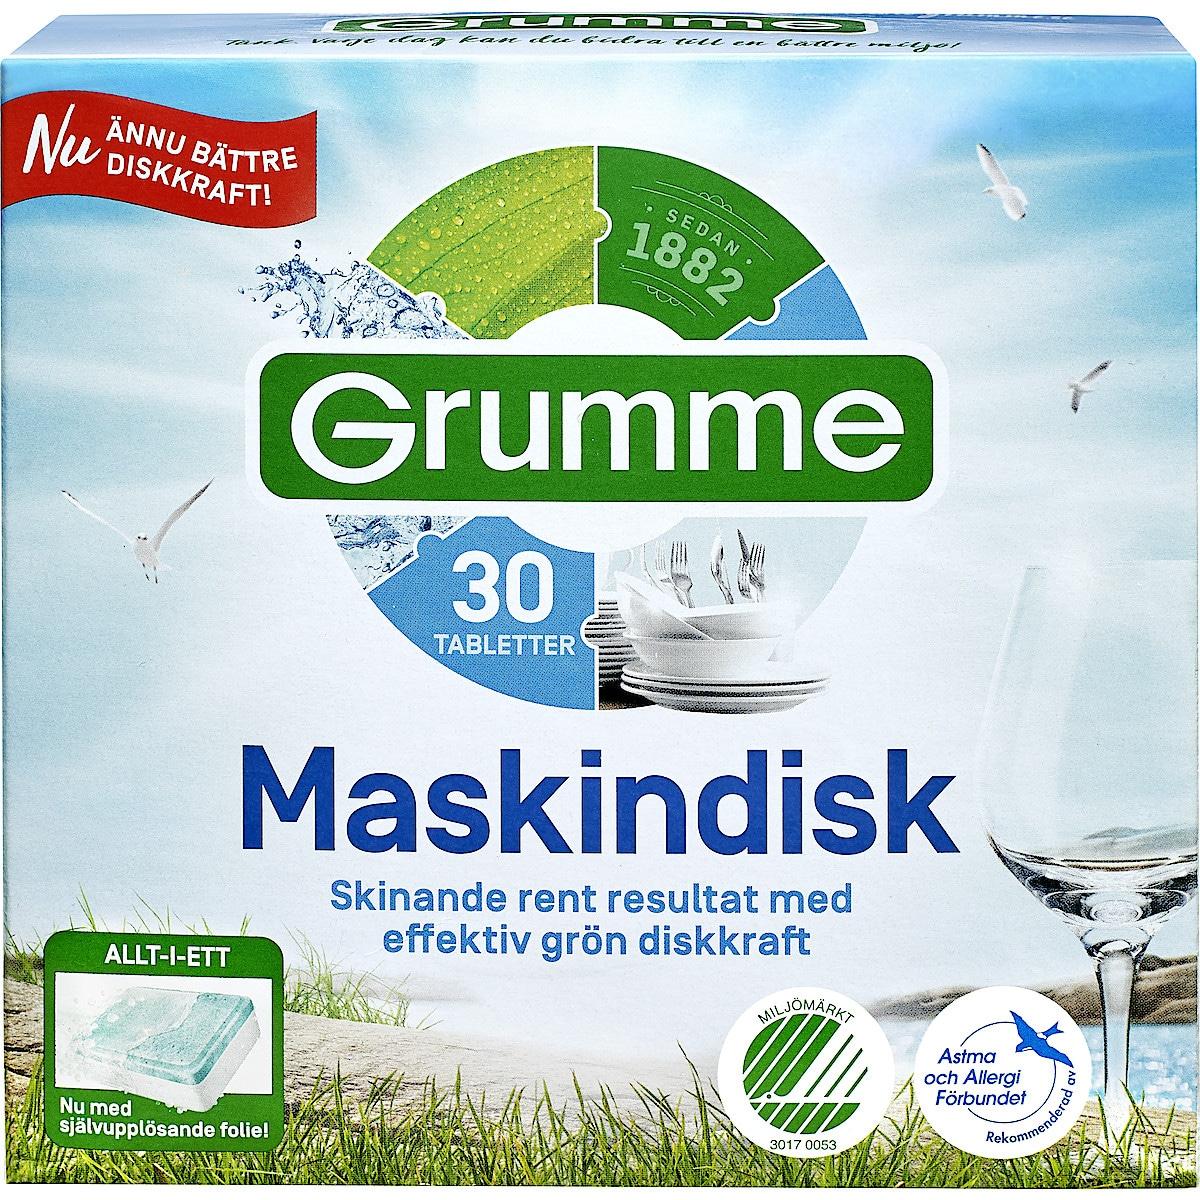 Maskindisktabletter Grumme 30-pack